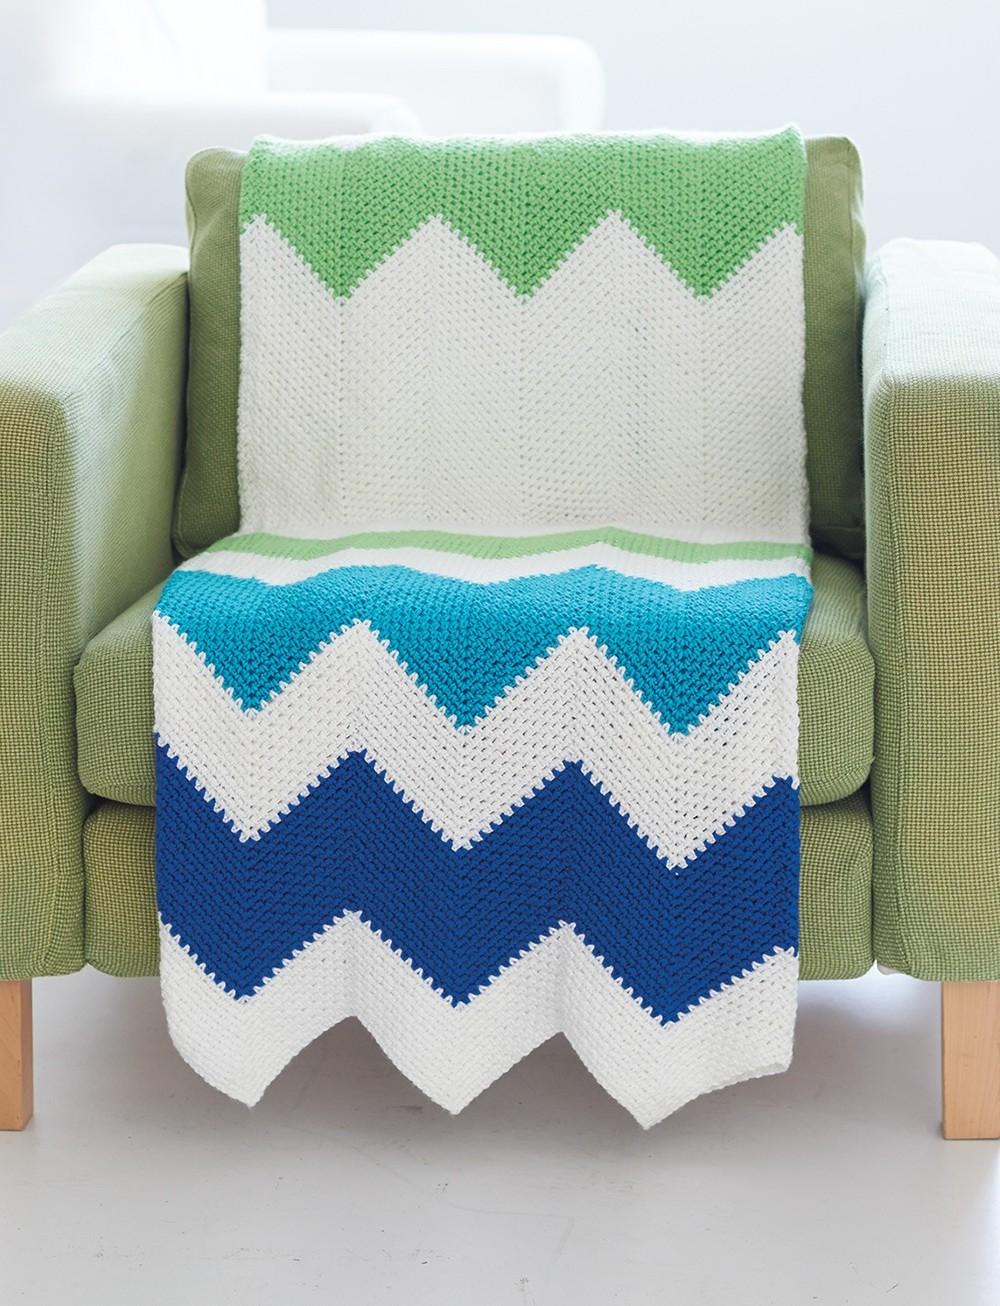 Easy Zig Zag Crochet Baby Blanket Pattern : Contemporary Zig Zag Throw AllFreeCrochetAfghanPatterns.com